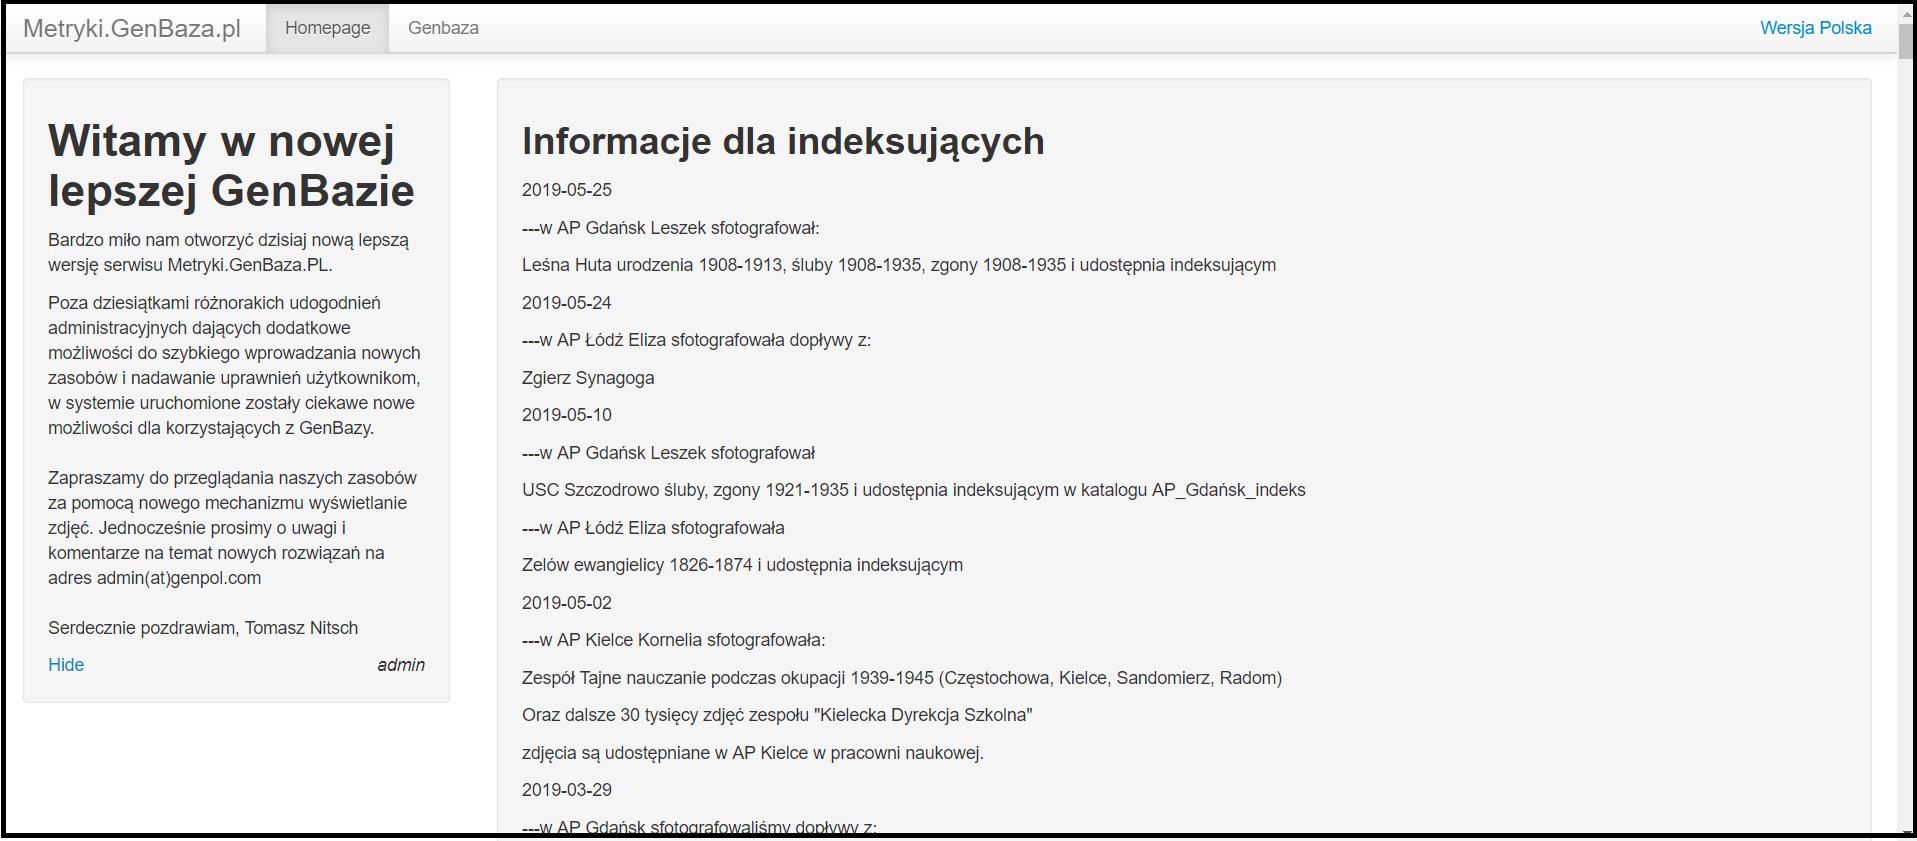 Metryki litewskie online dating